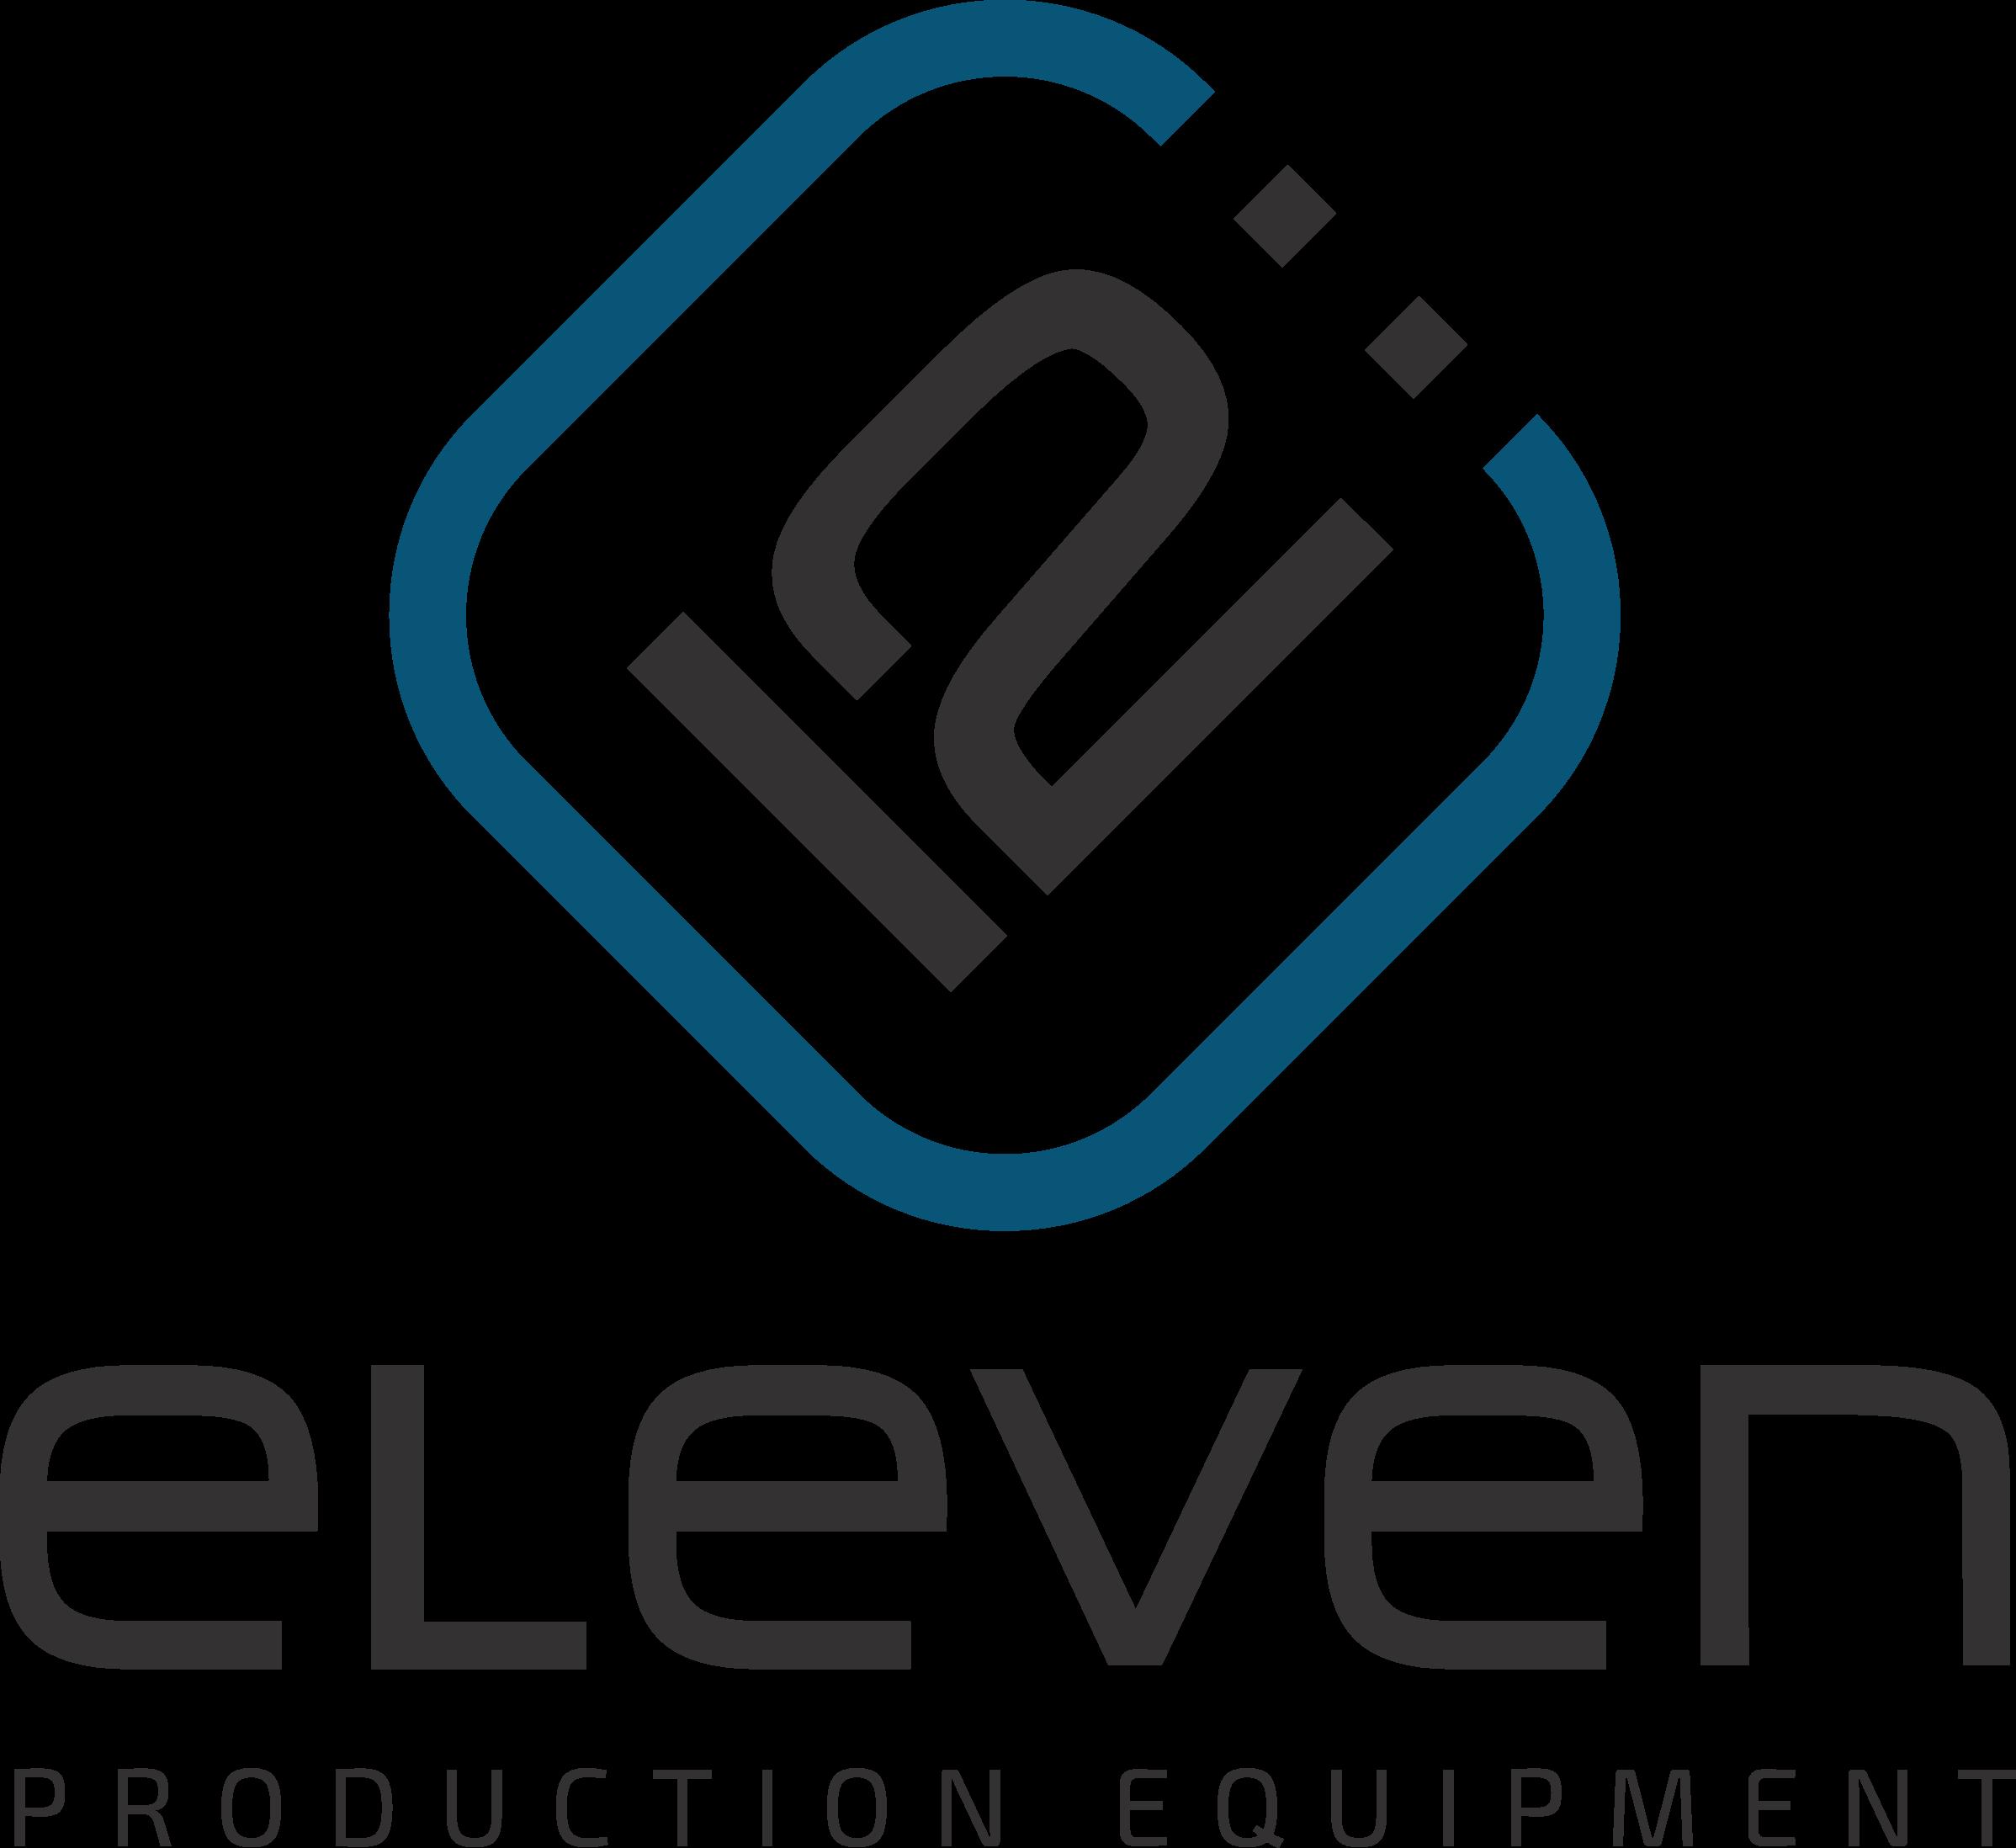 12eleven Production Equipment